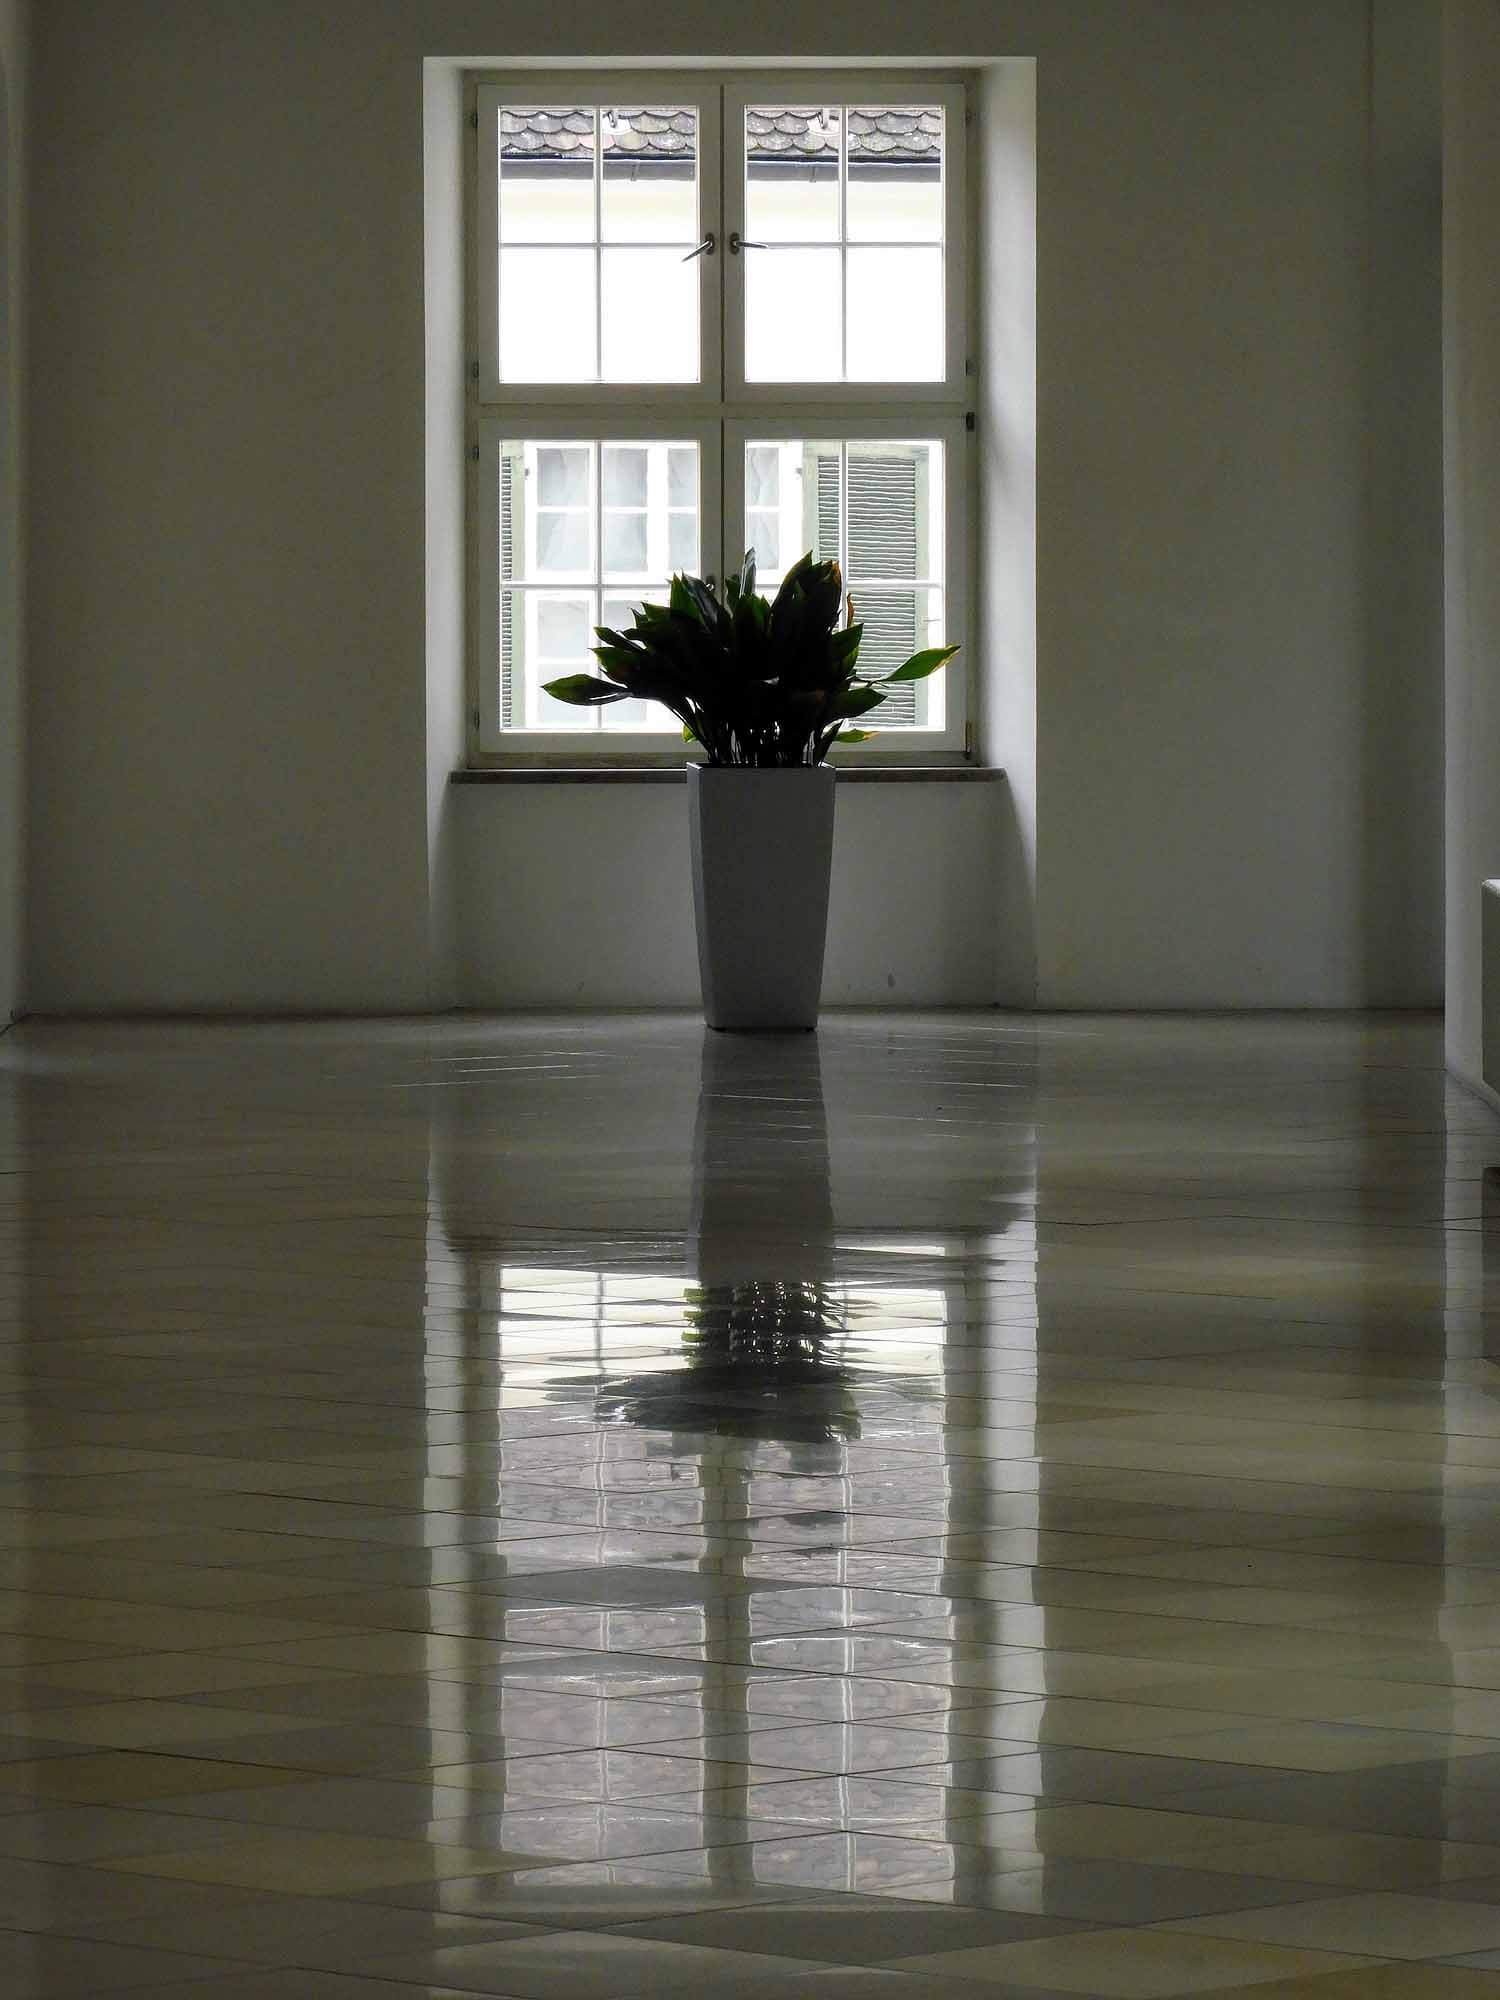 germany-kloster-ochsenhausen-hallway-vase.jpg